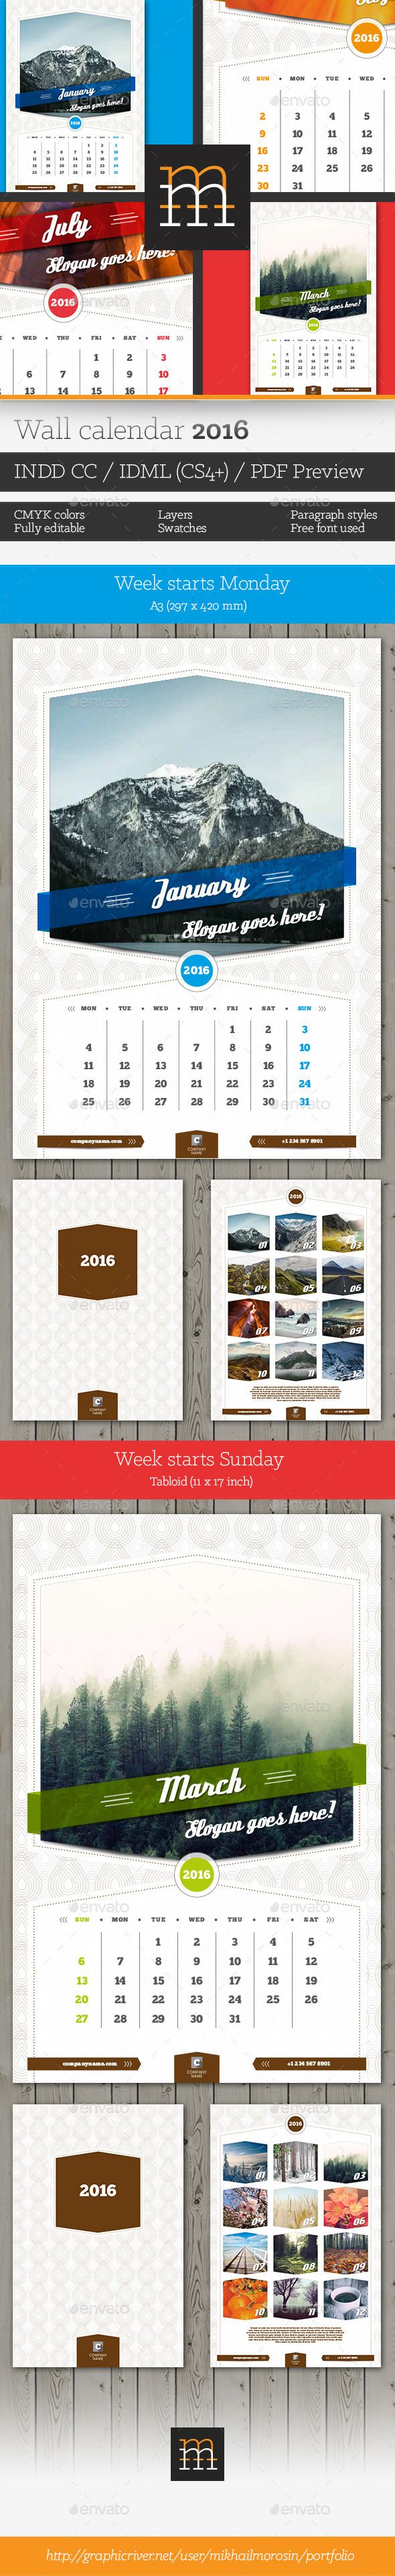 Wall Calendar 2016 Layered InDesign files .INDD CC Template #design Download: http://graphicriver.net/item/wall-calendar-2016/12820300?ref=ksioks